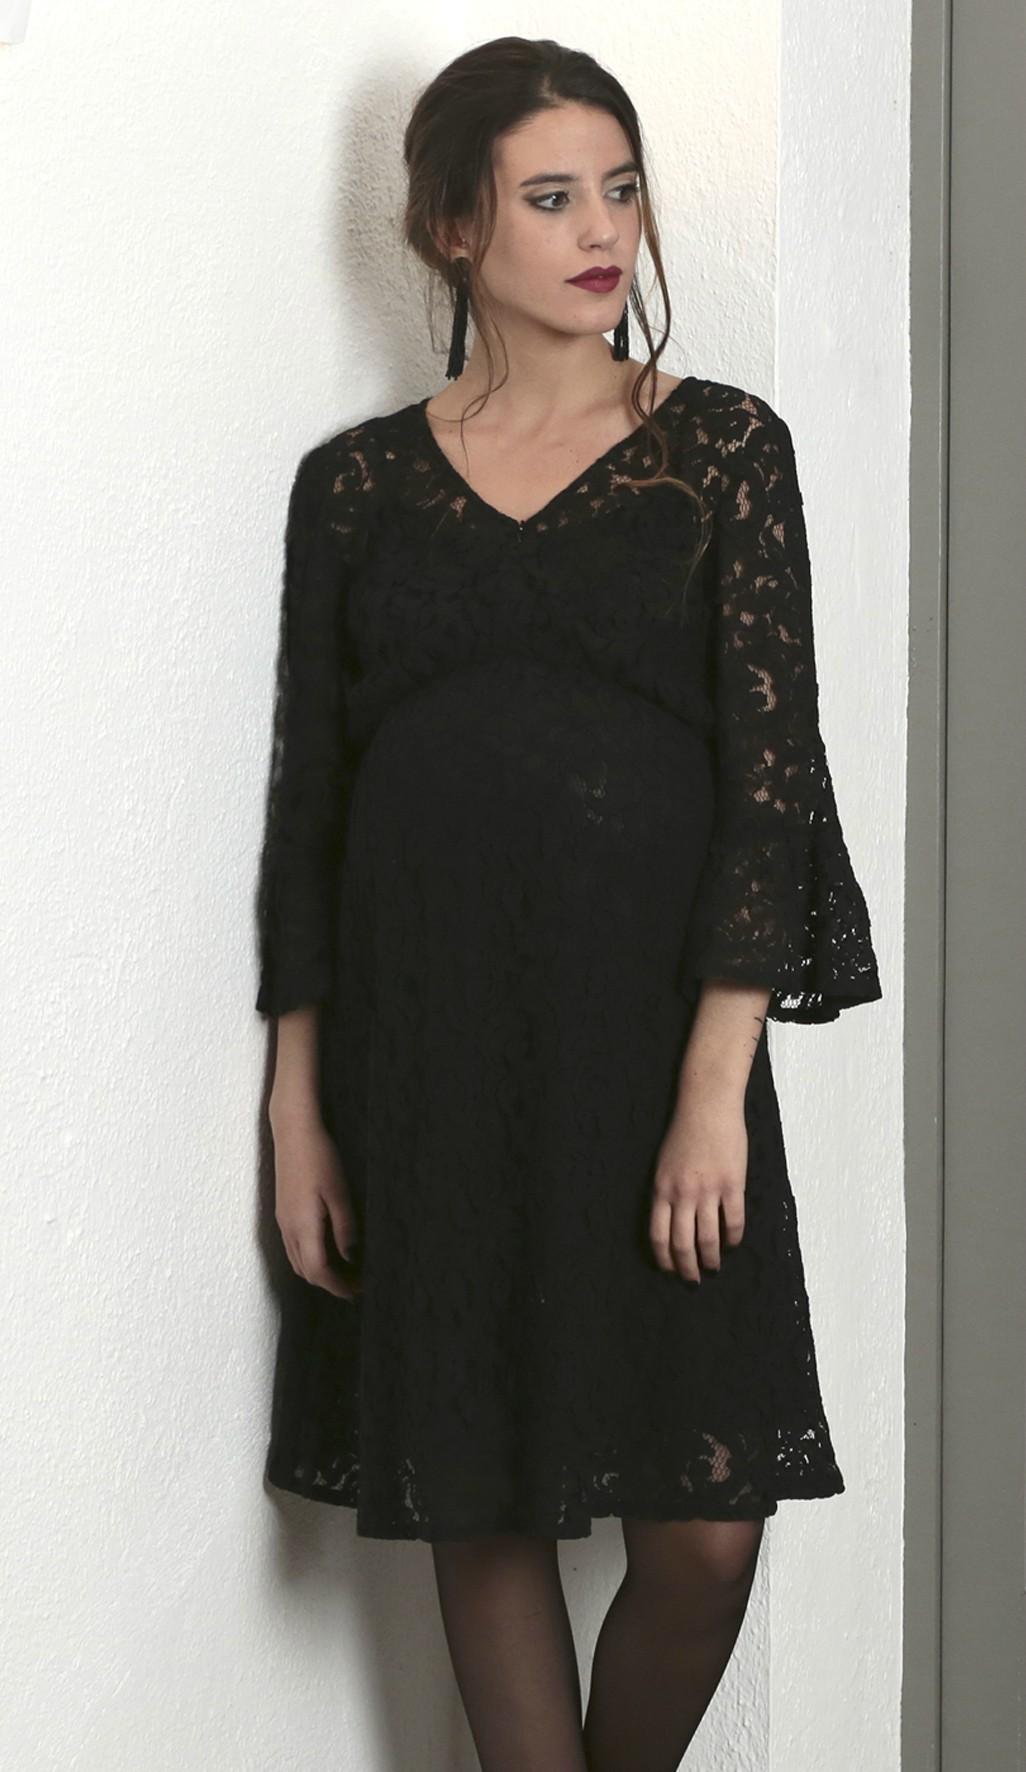 d8d1e9754 vestido-fiesta-lactancia-encaje-negro-maminess3